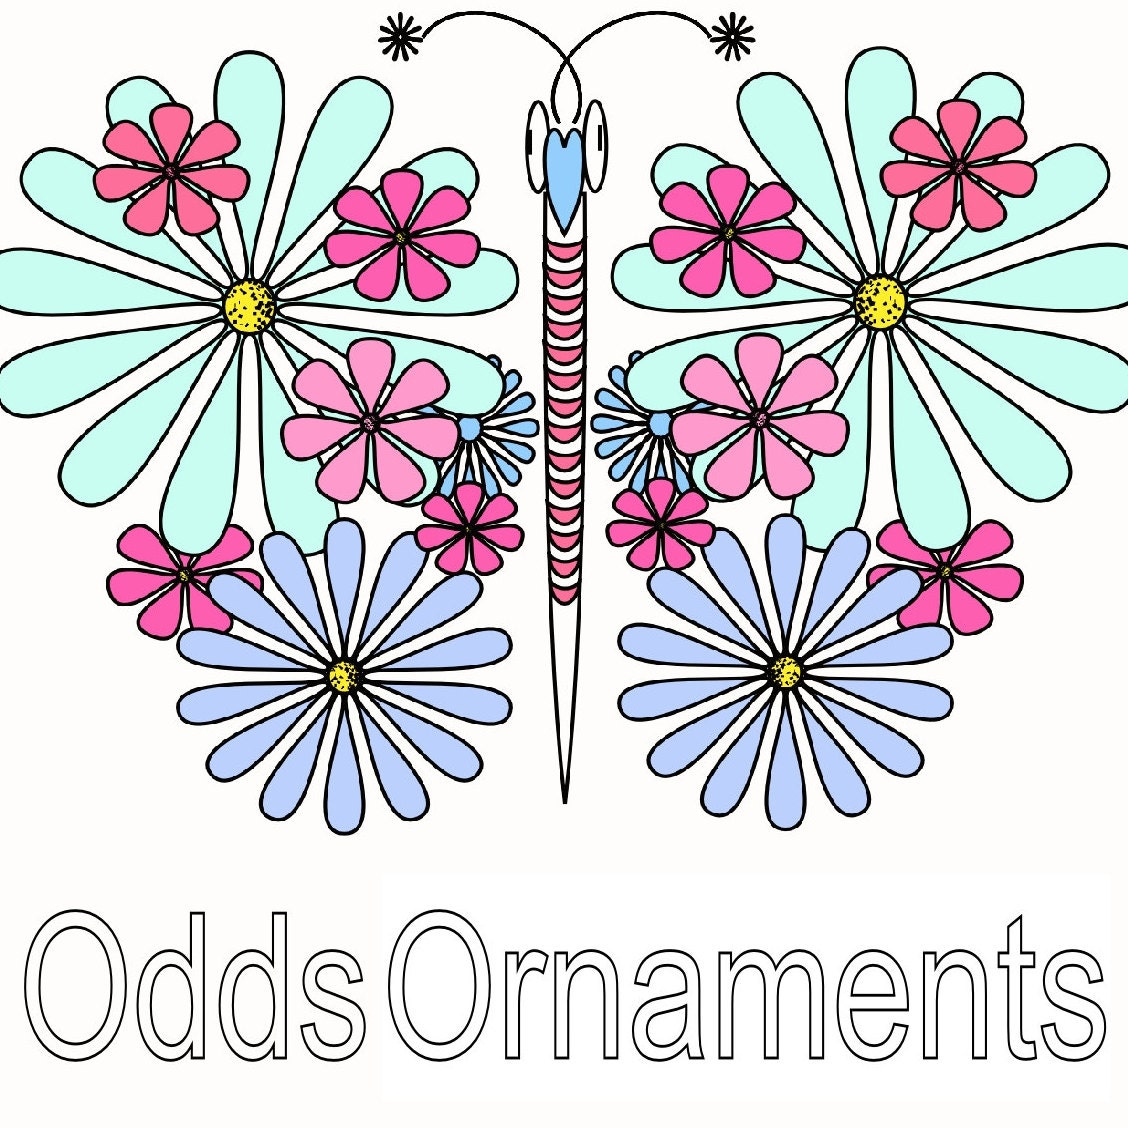 Odds Ornaments von OddsOrnaments auf Etsy